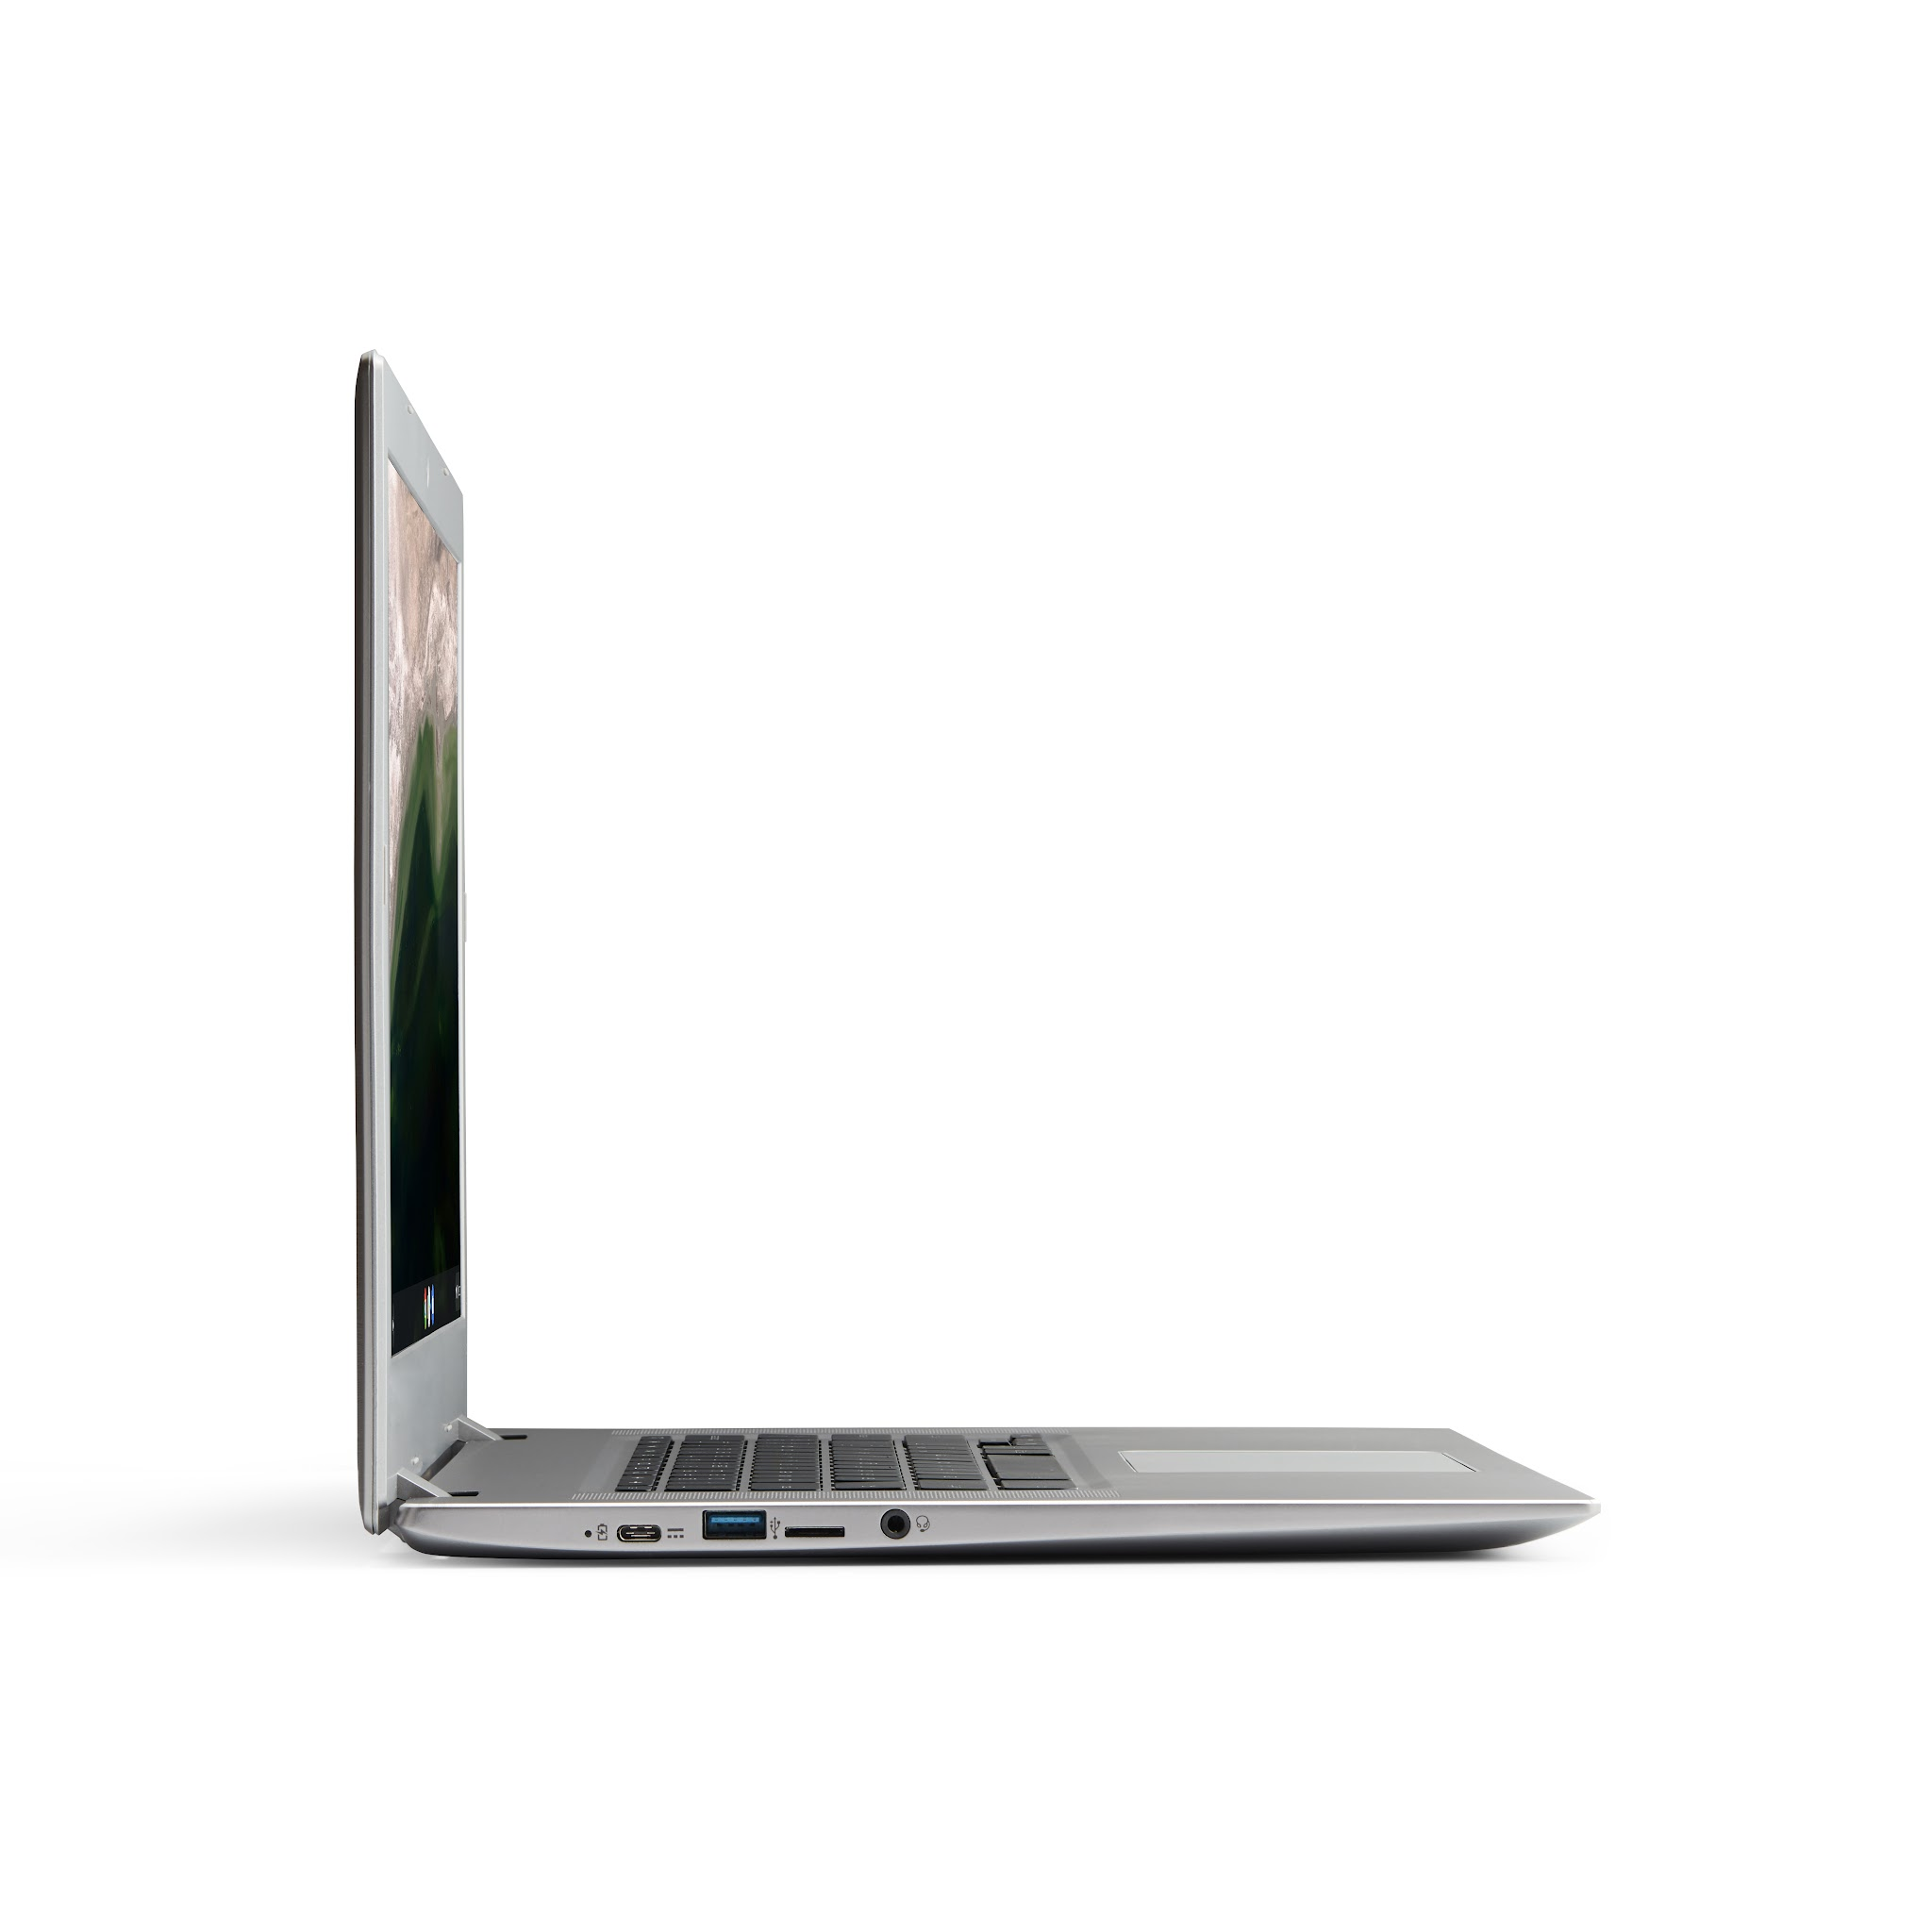 Acer Chromebook 15 (CB315-1HT) - photo 4